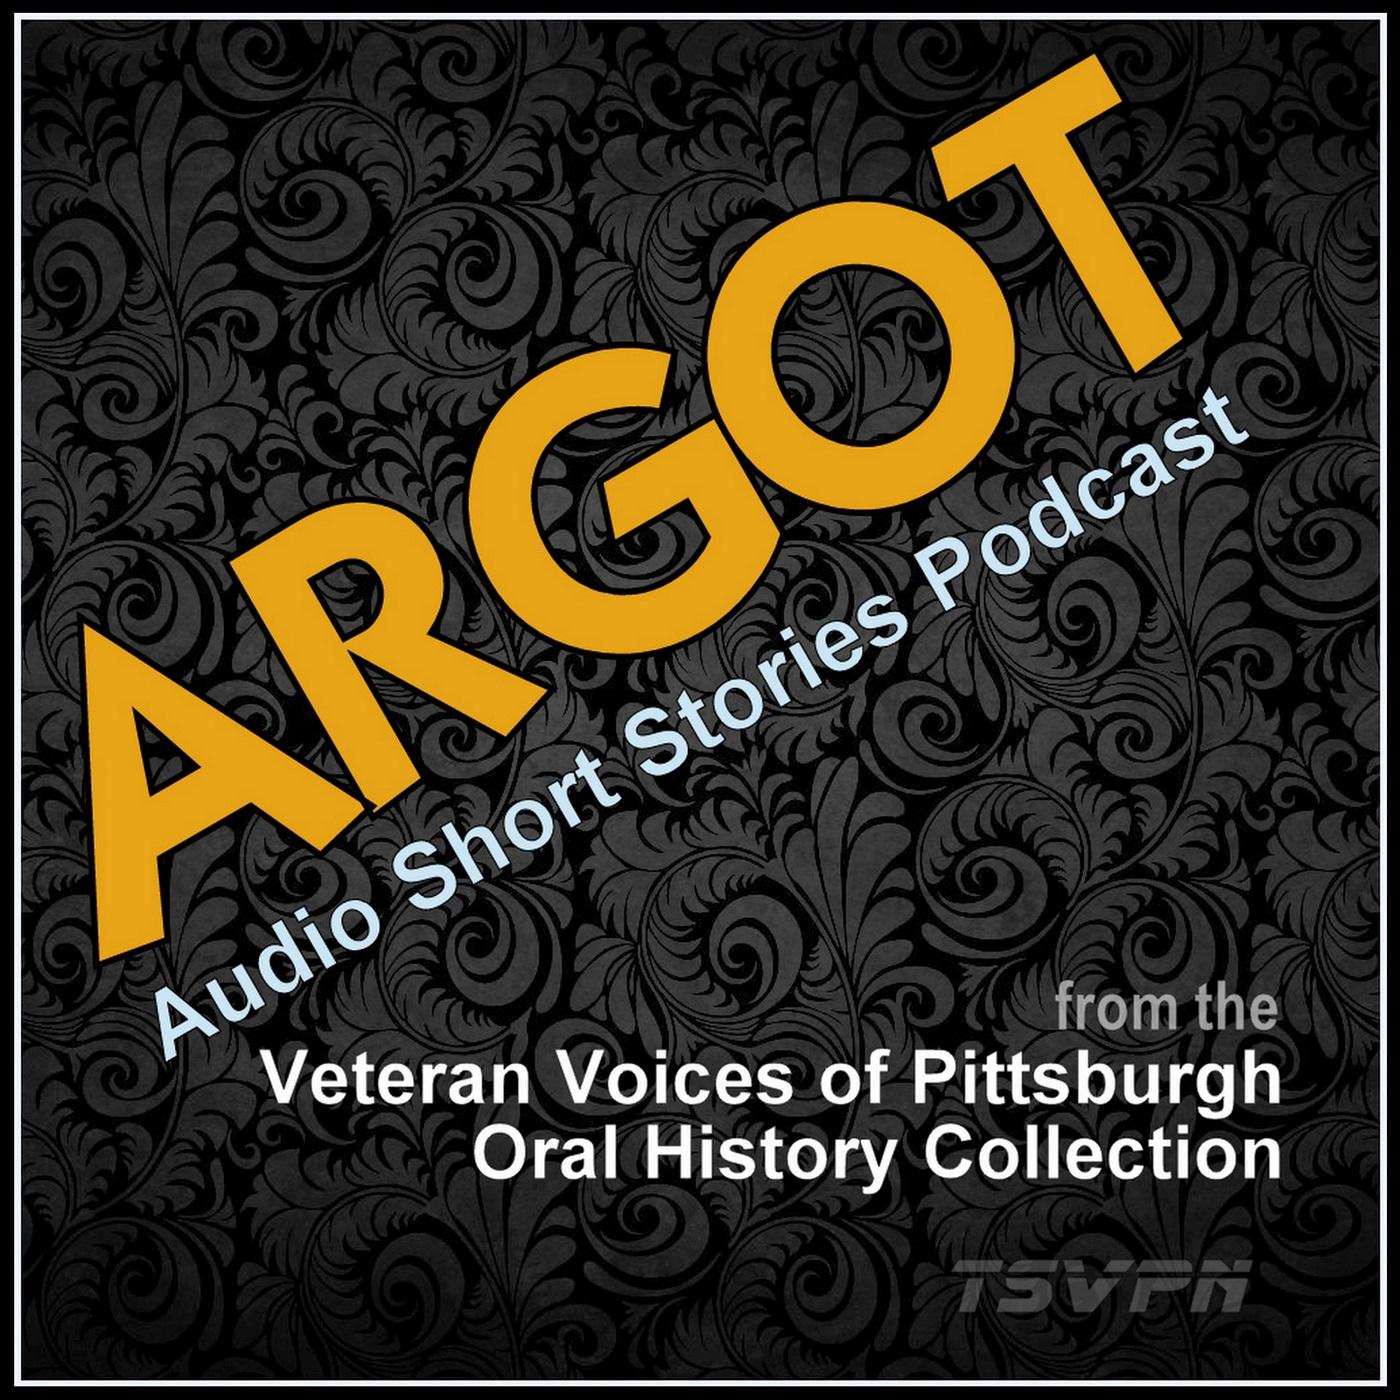 Argot: The Veterans Short Story Collection